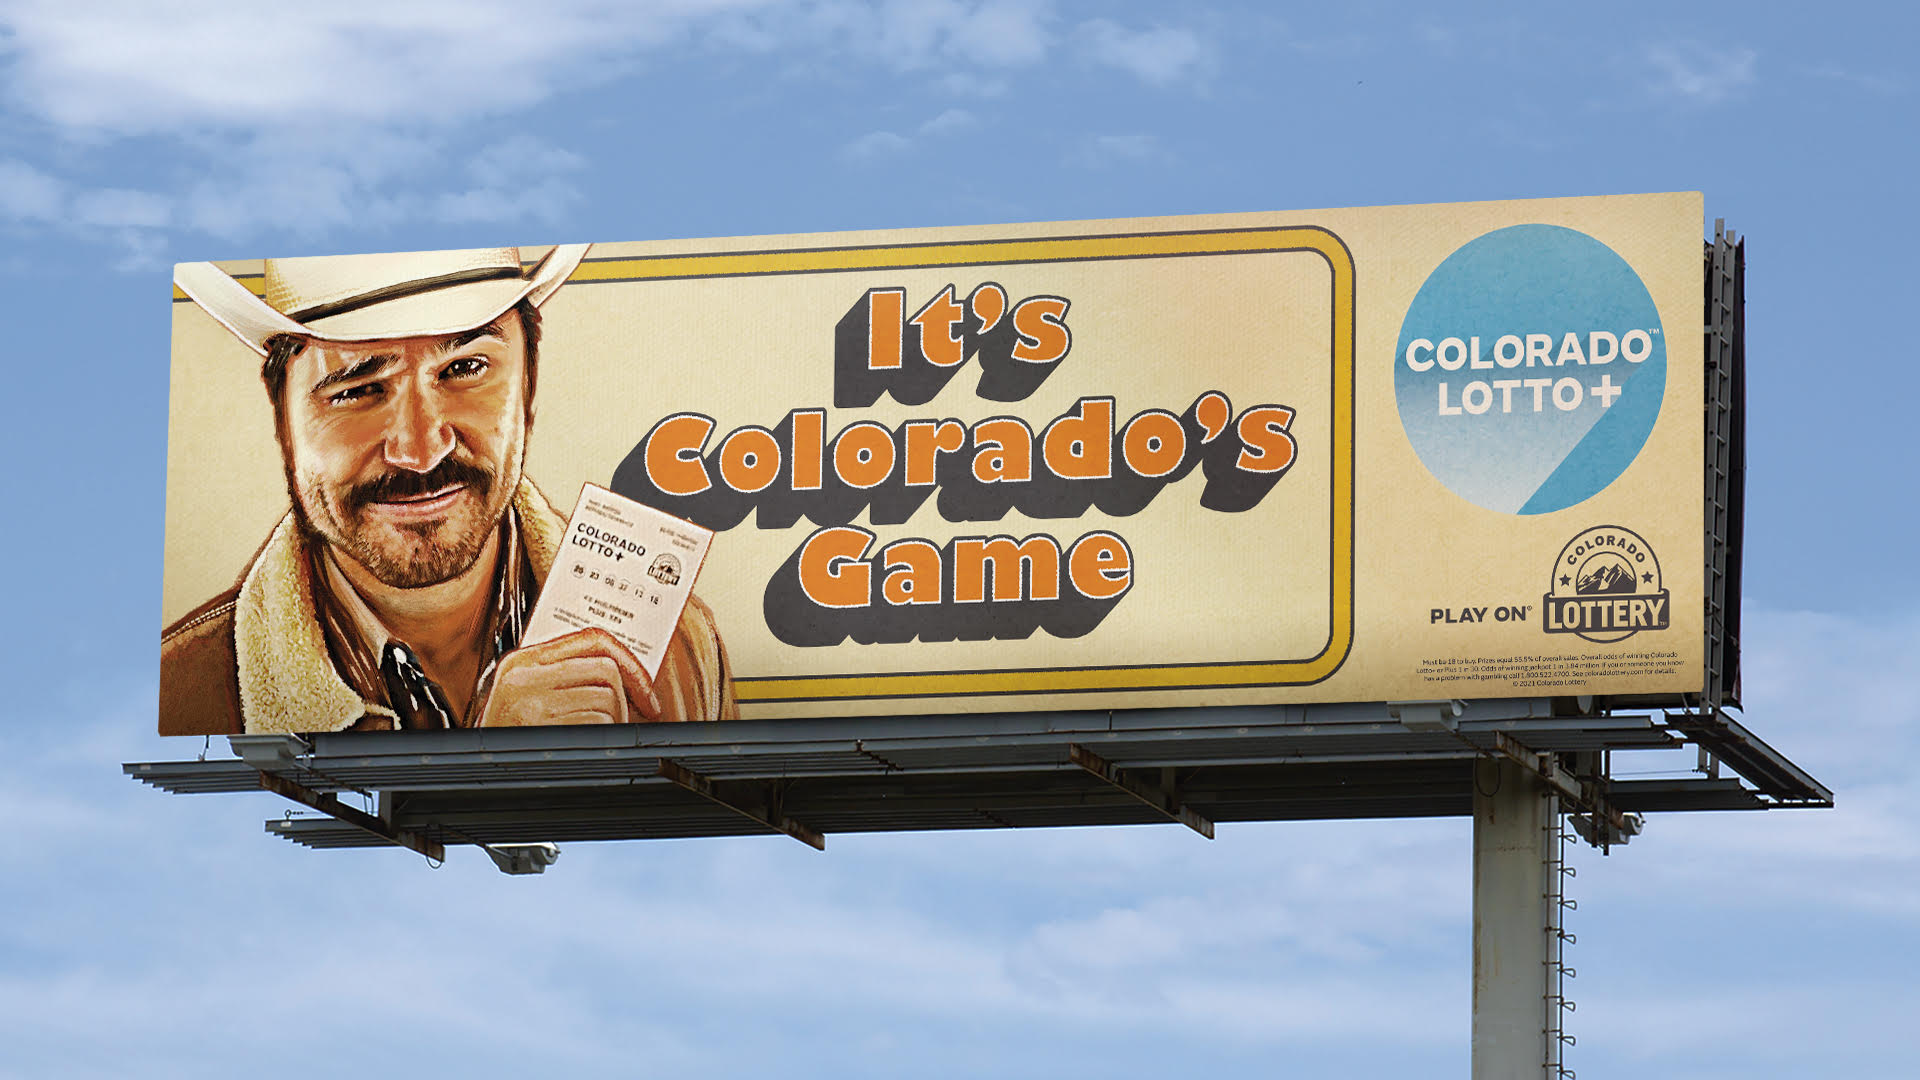 Colorado Lottery billboard 2